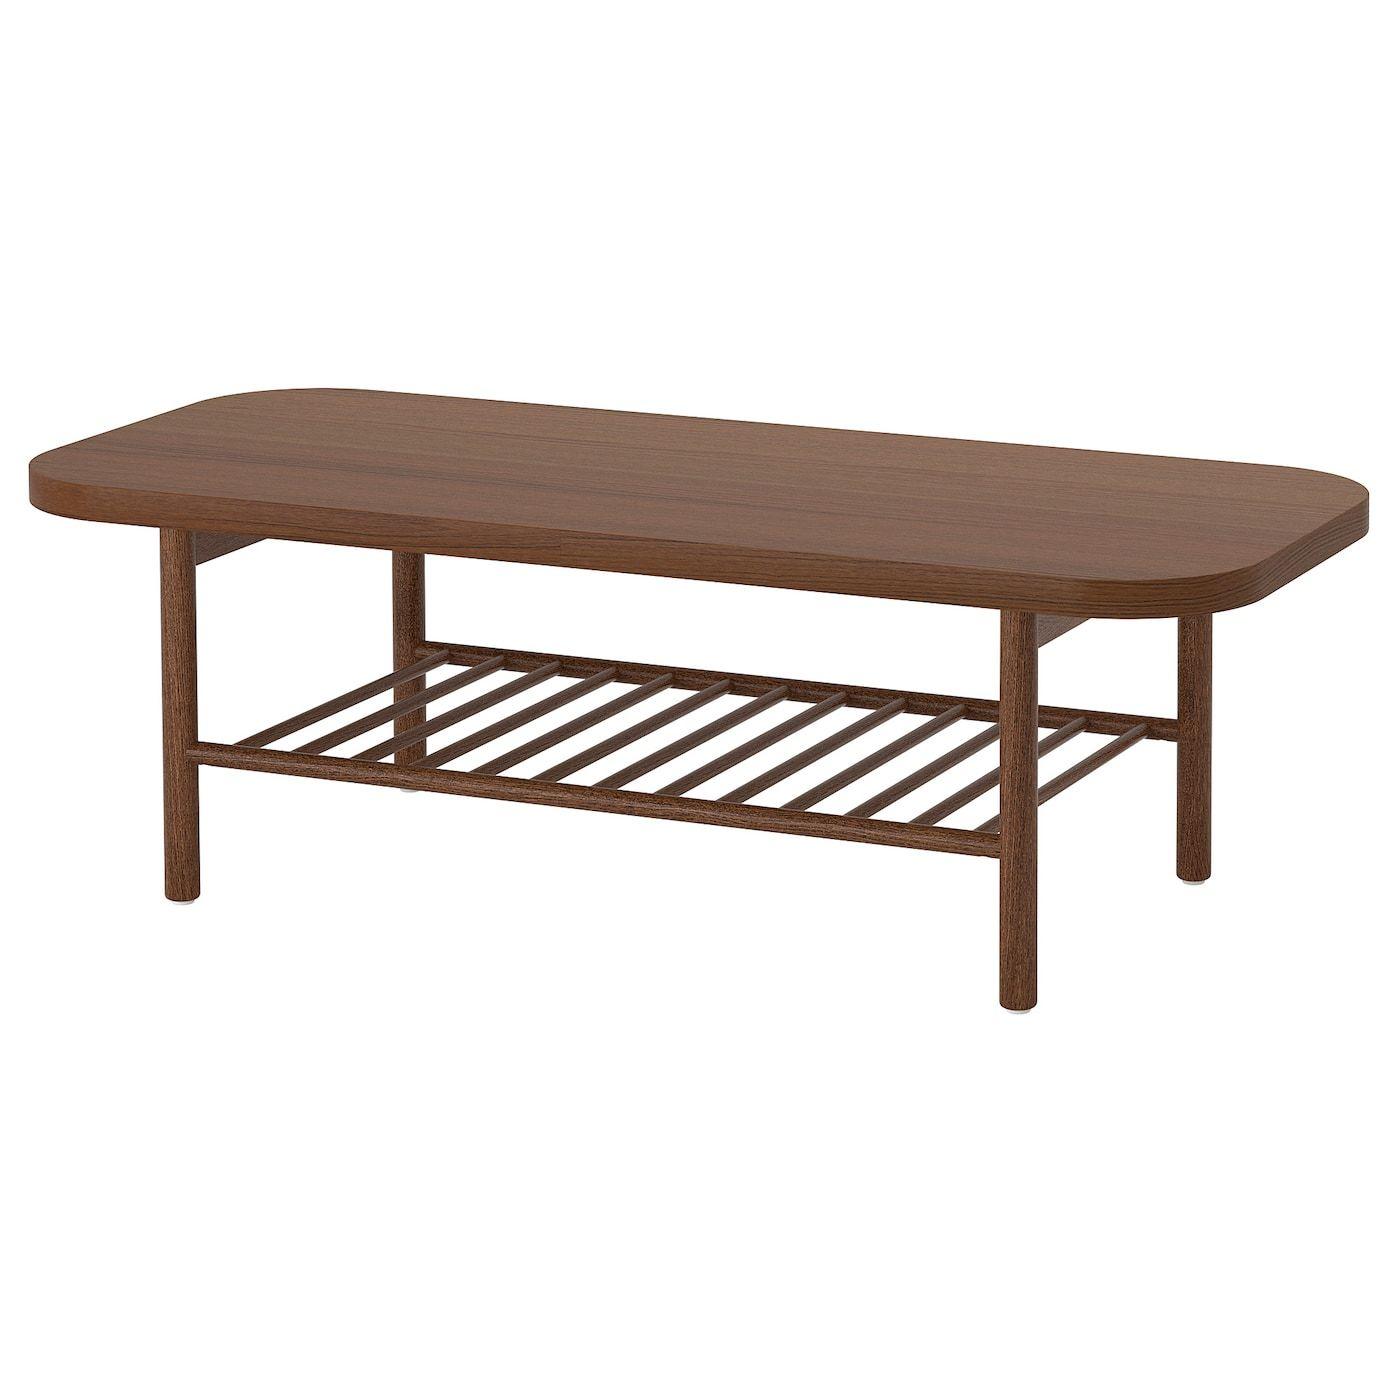 Listerby Salontafel Bruin 140x60 Cm Ikea Brown Coffee Table Ikea Coffee Table Coffee Table [ 1400 x 1400 Pixel ]